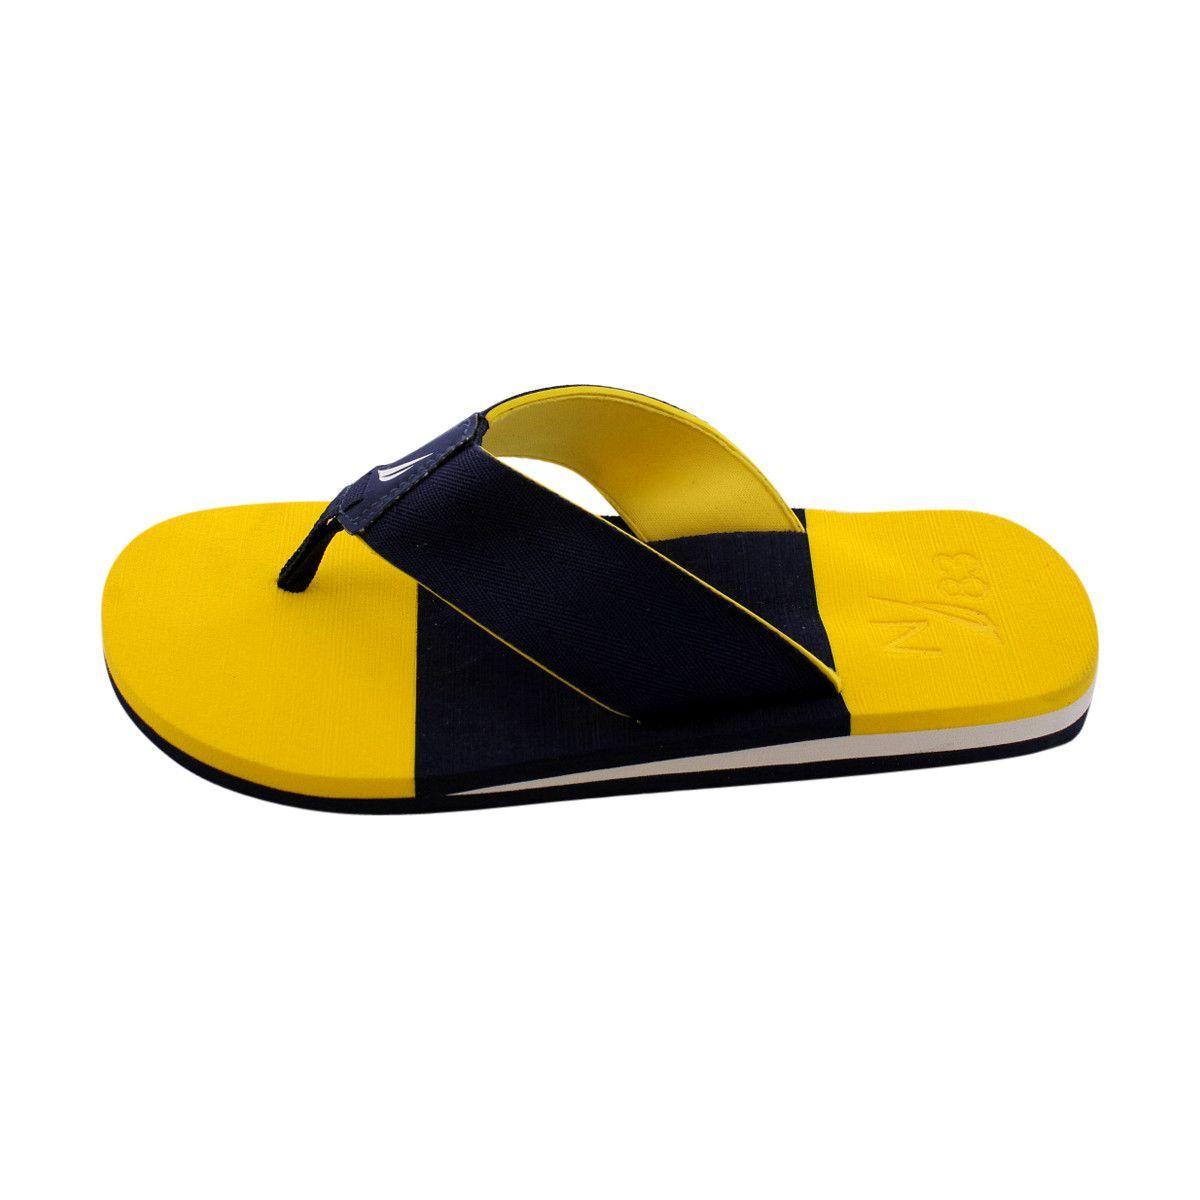 Mens Flip Flops Slippers Italia Belgium Flag Print Thong Sandals summer beach  9DPZVD0Q4